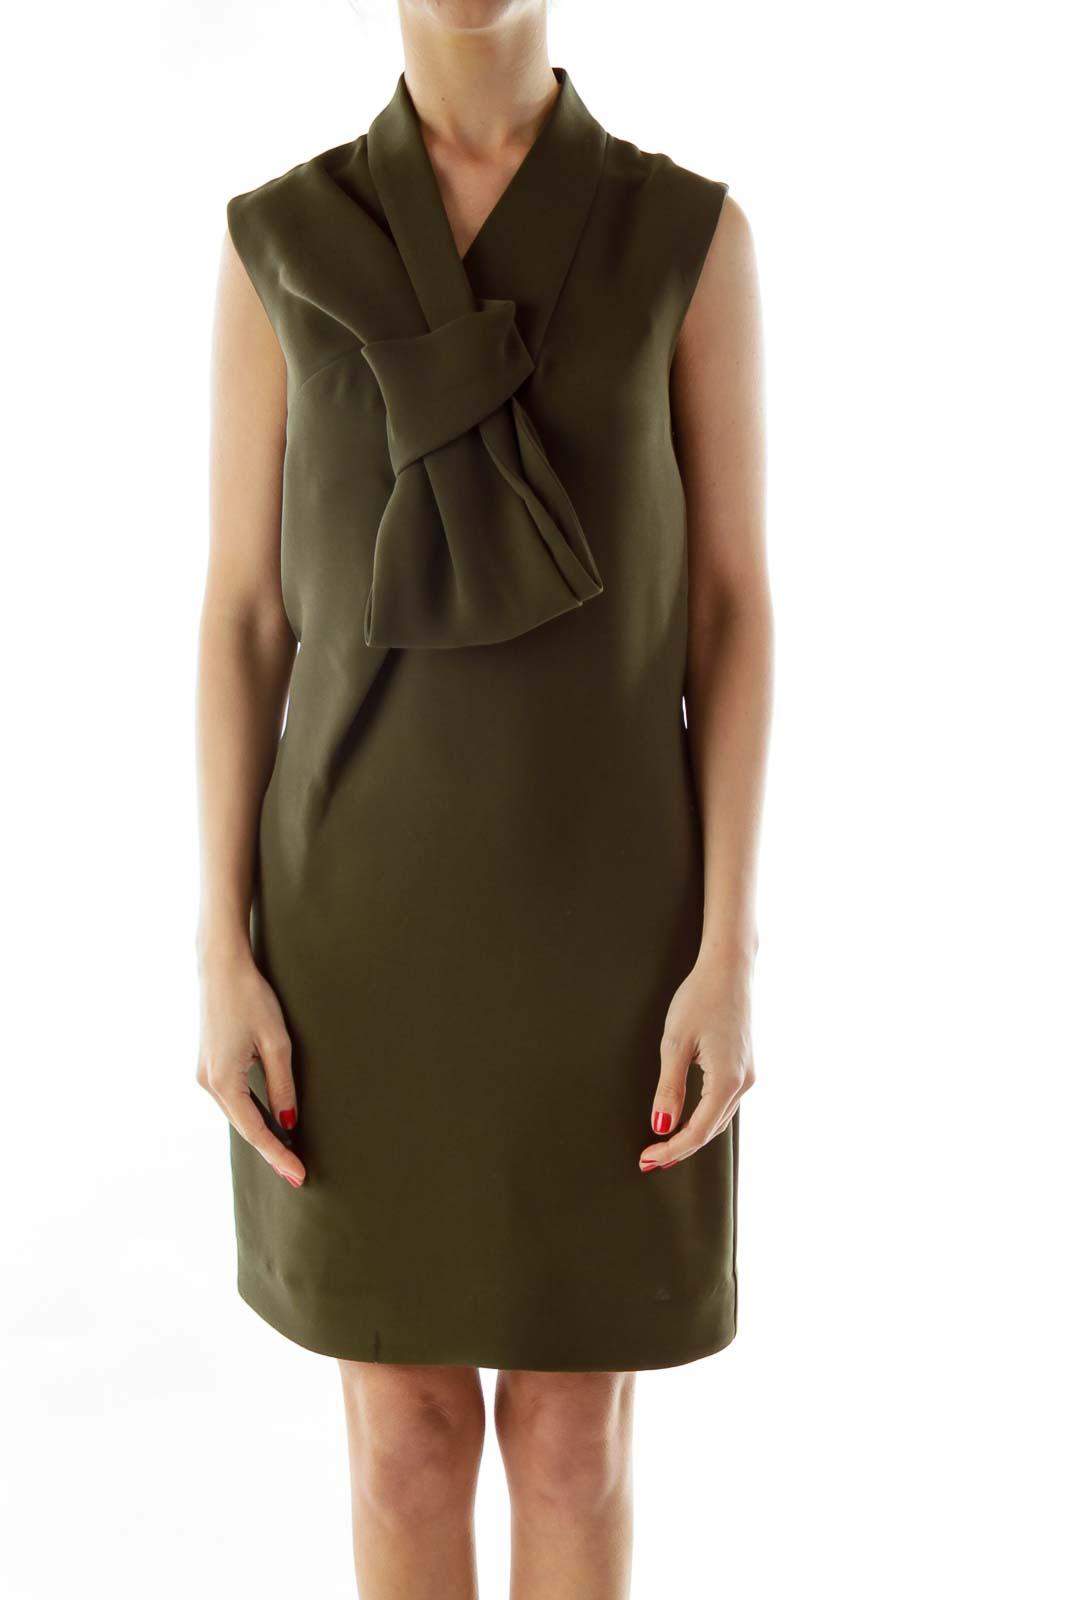 Green Bow Evening Dress Front